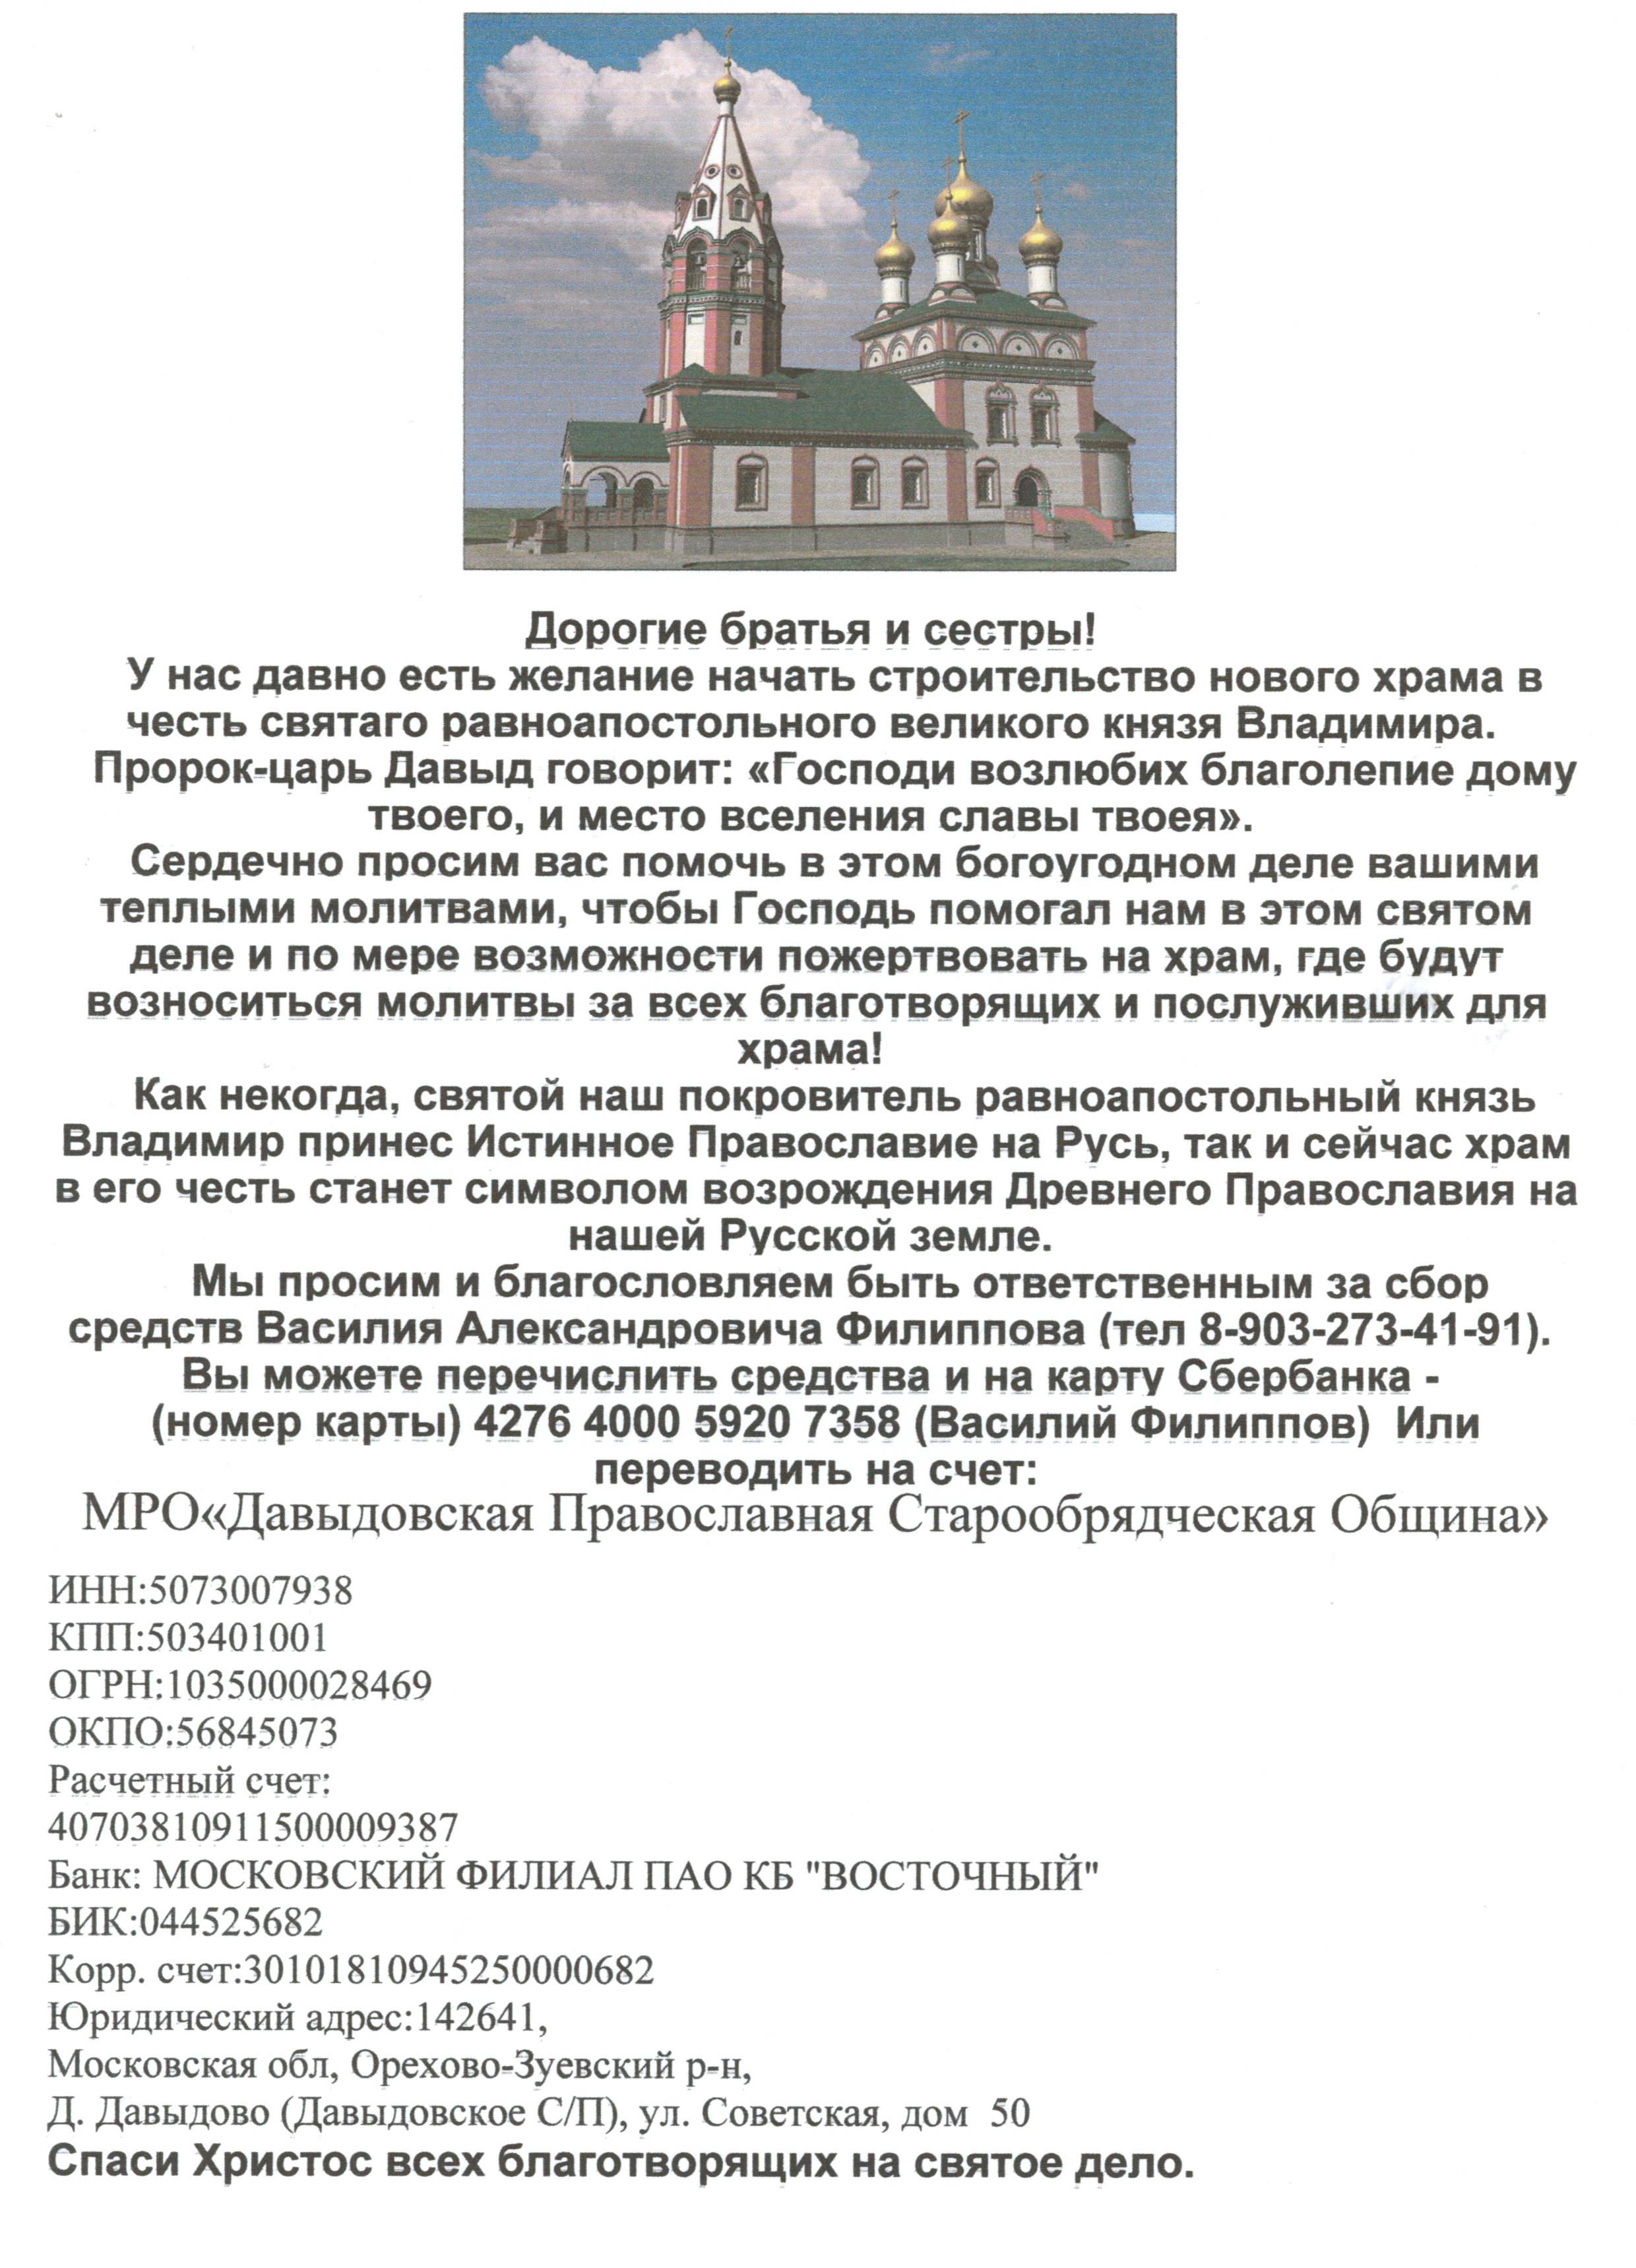 CCF06032017_00001